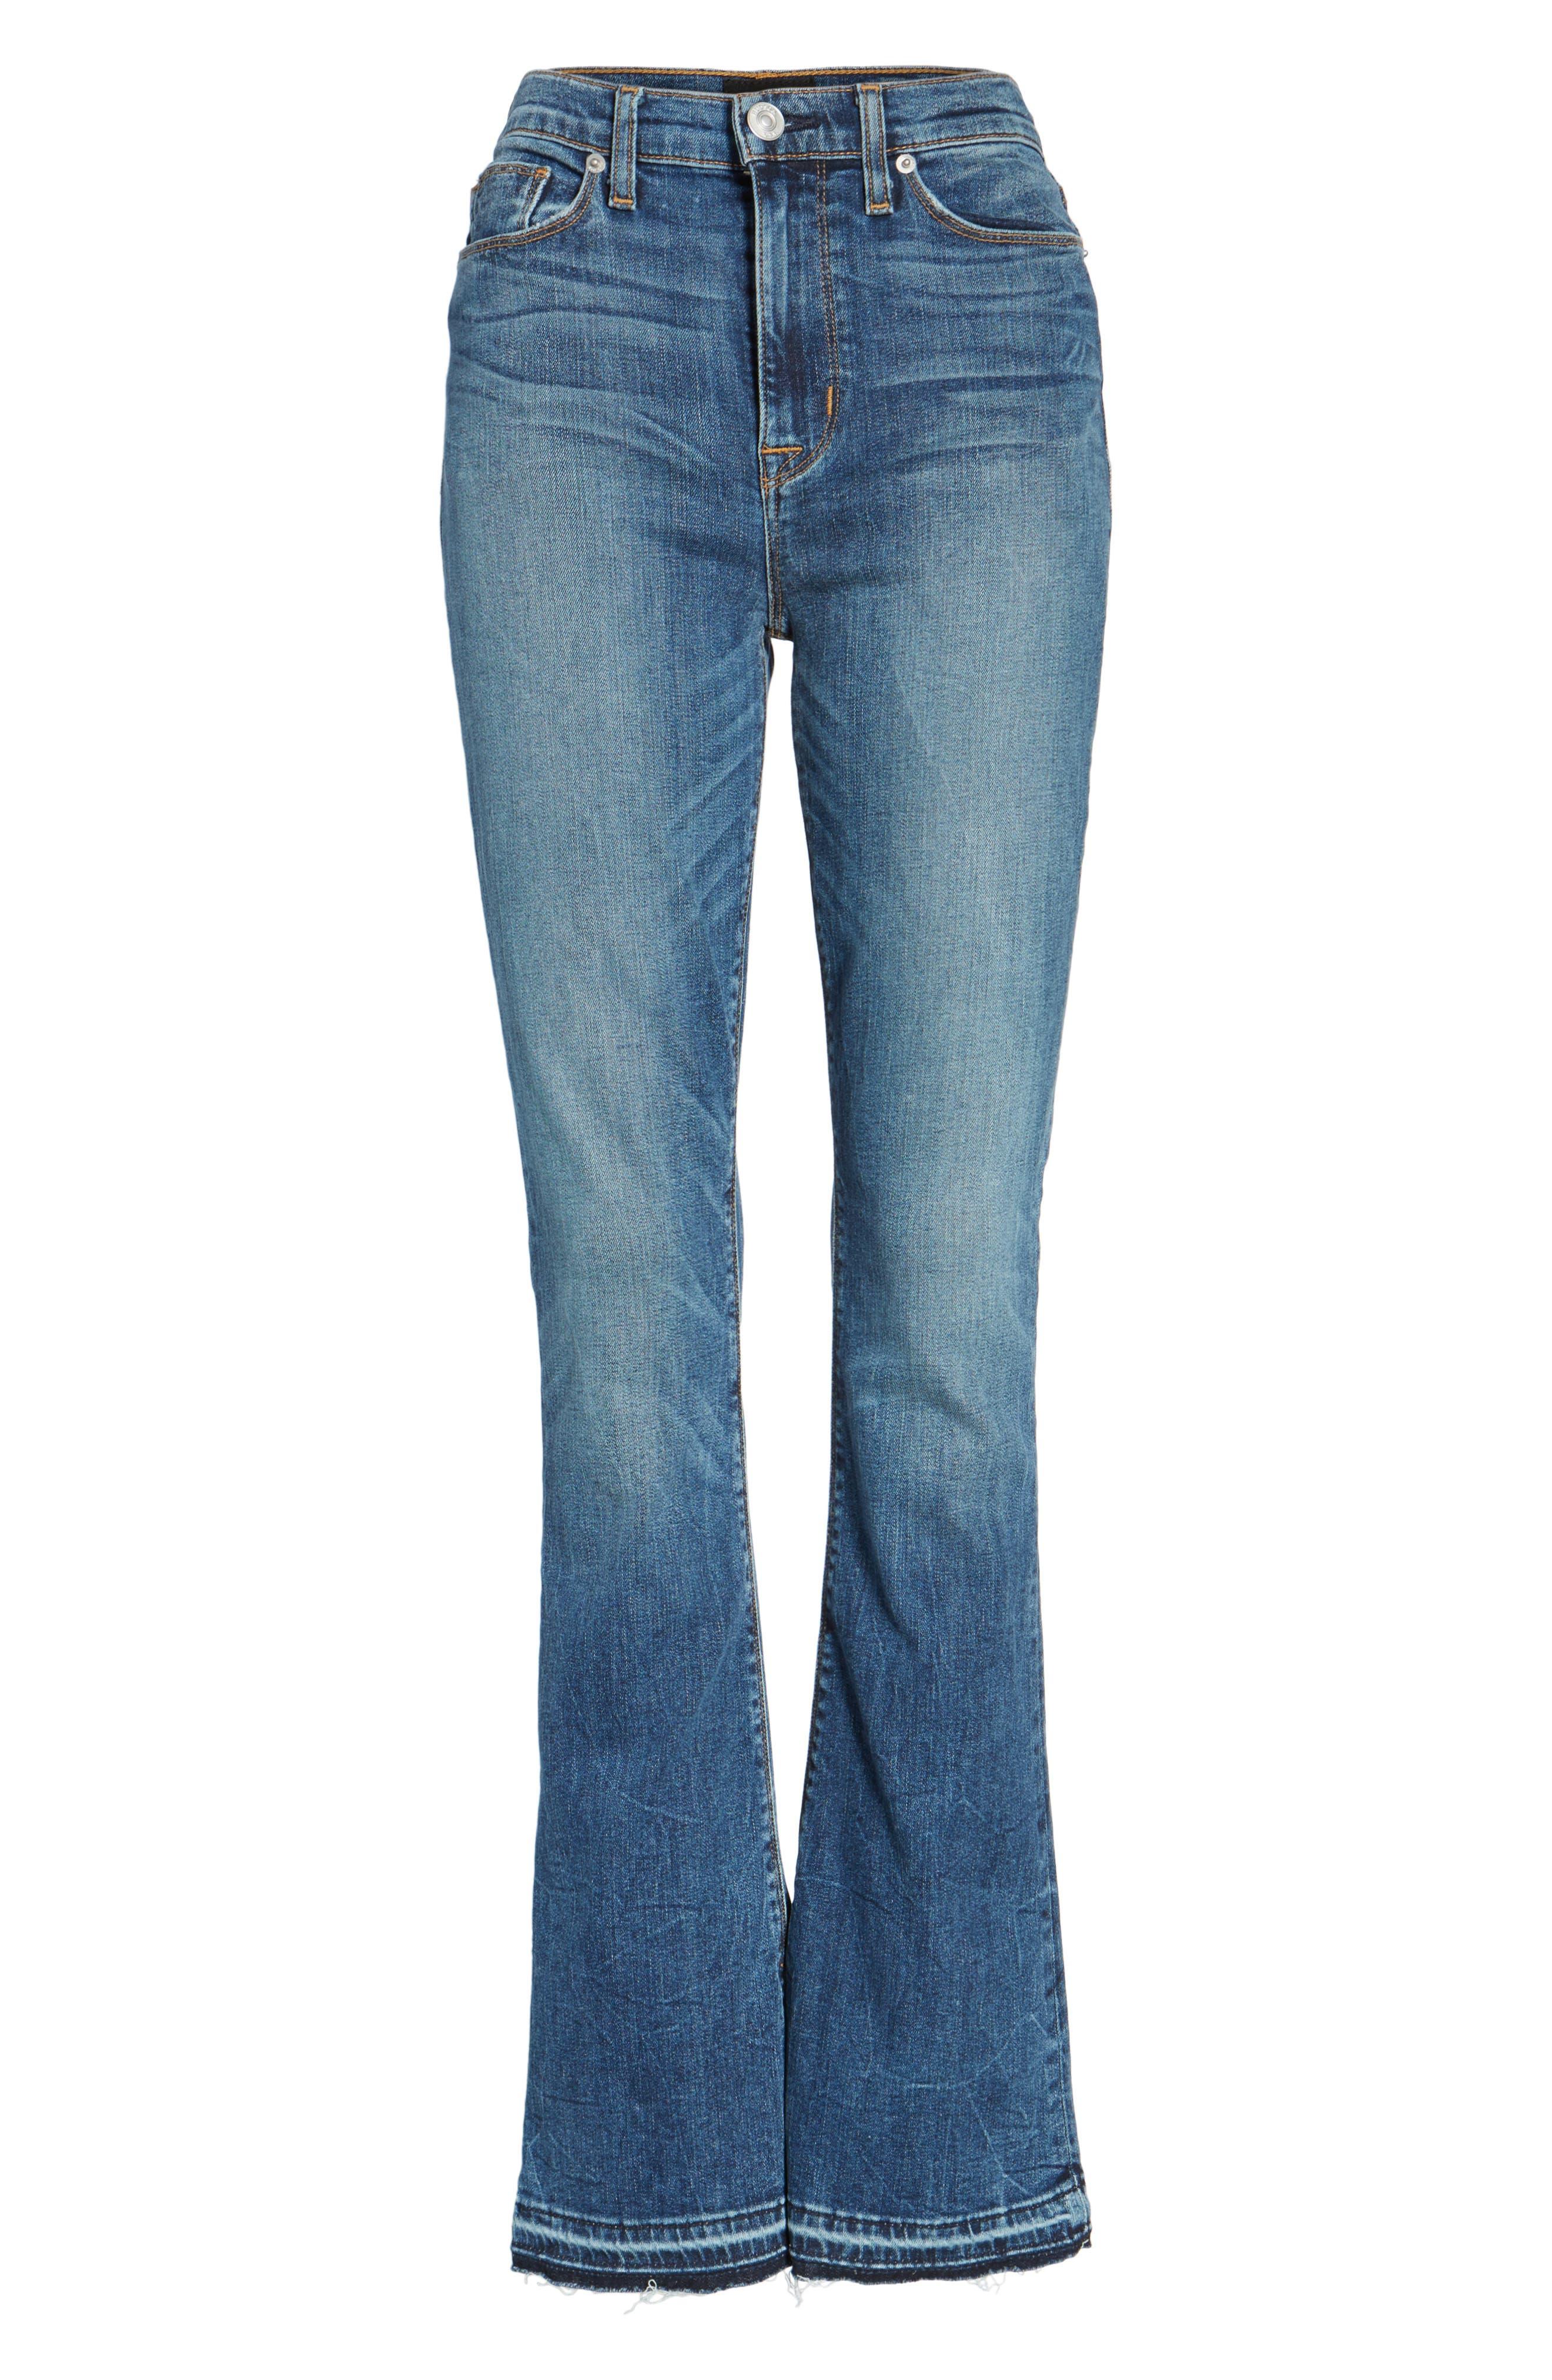 Heartbreaker High Waist Bootcut Jeans,                             Alternate thumbnail 6, color,                             SPLIT SECOND